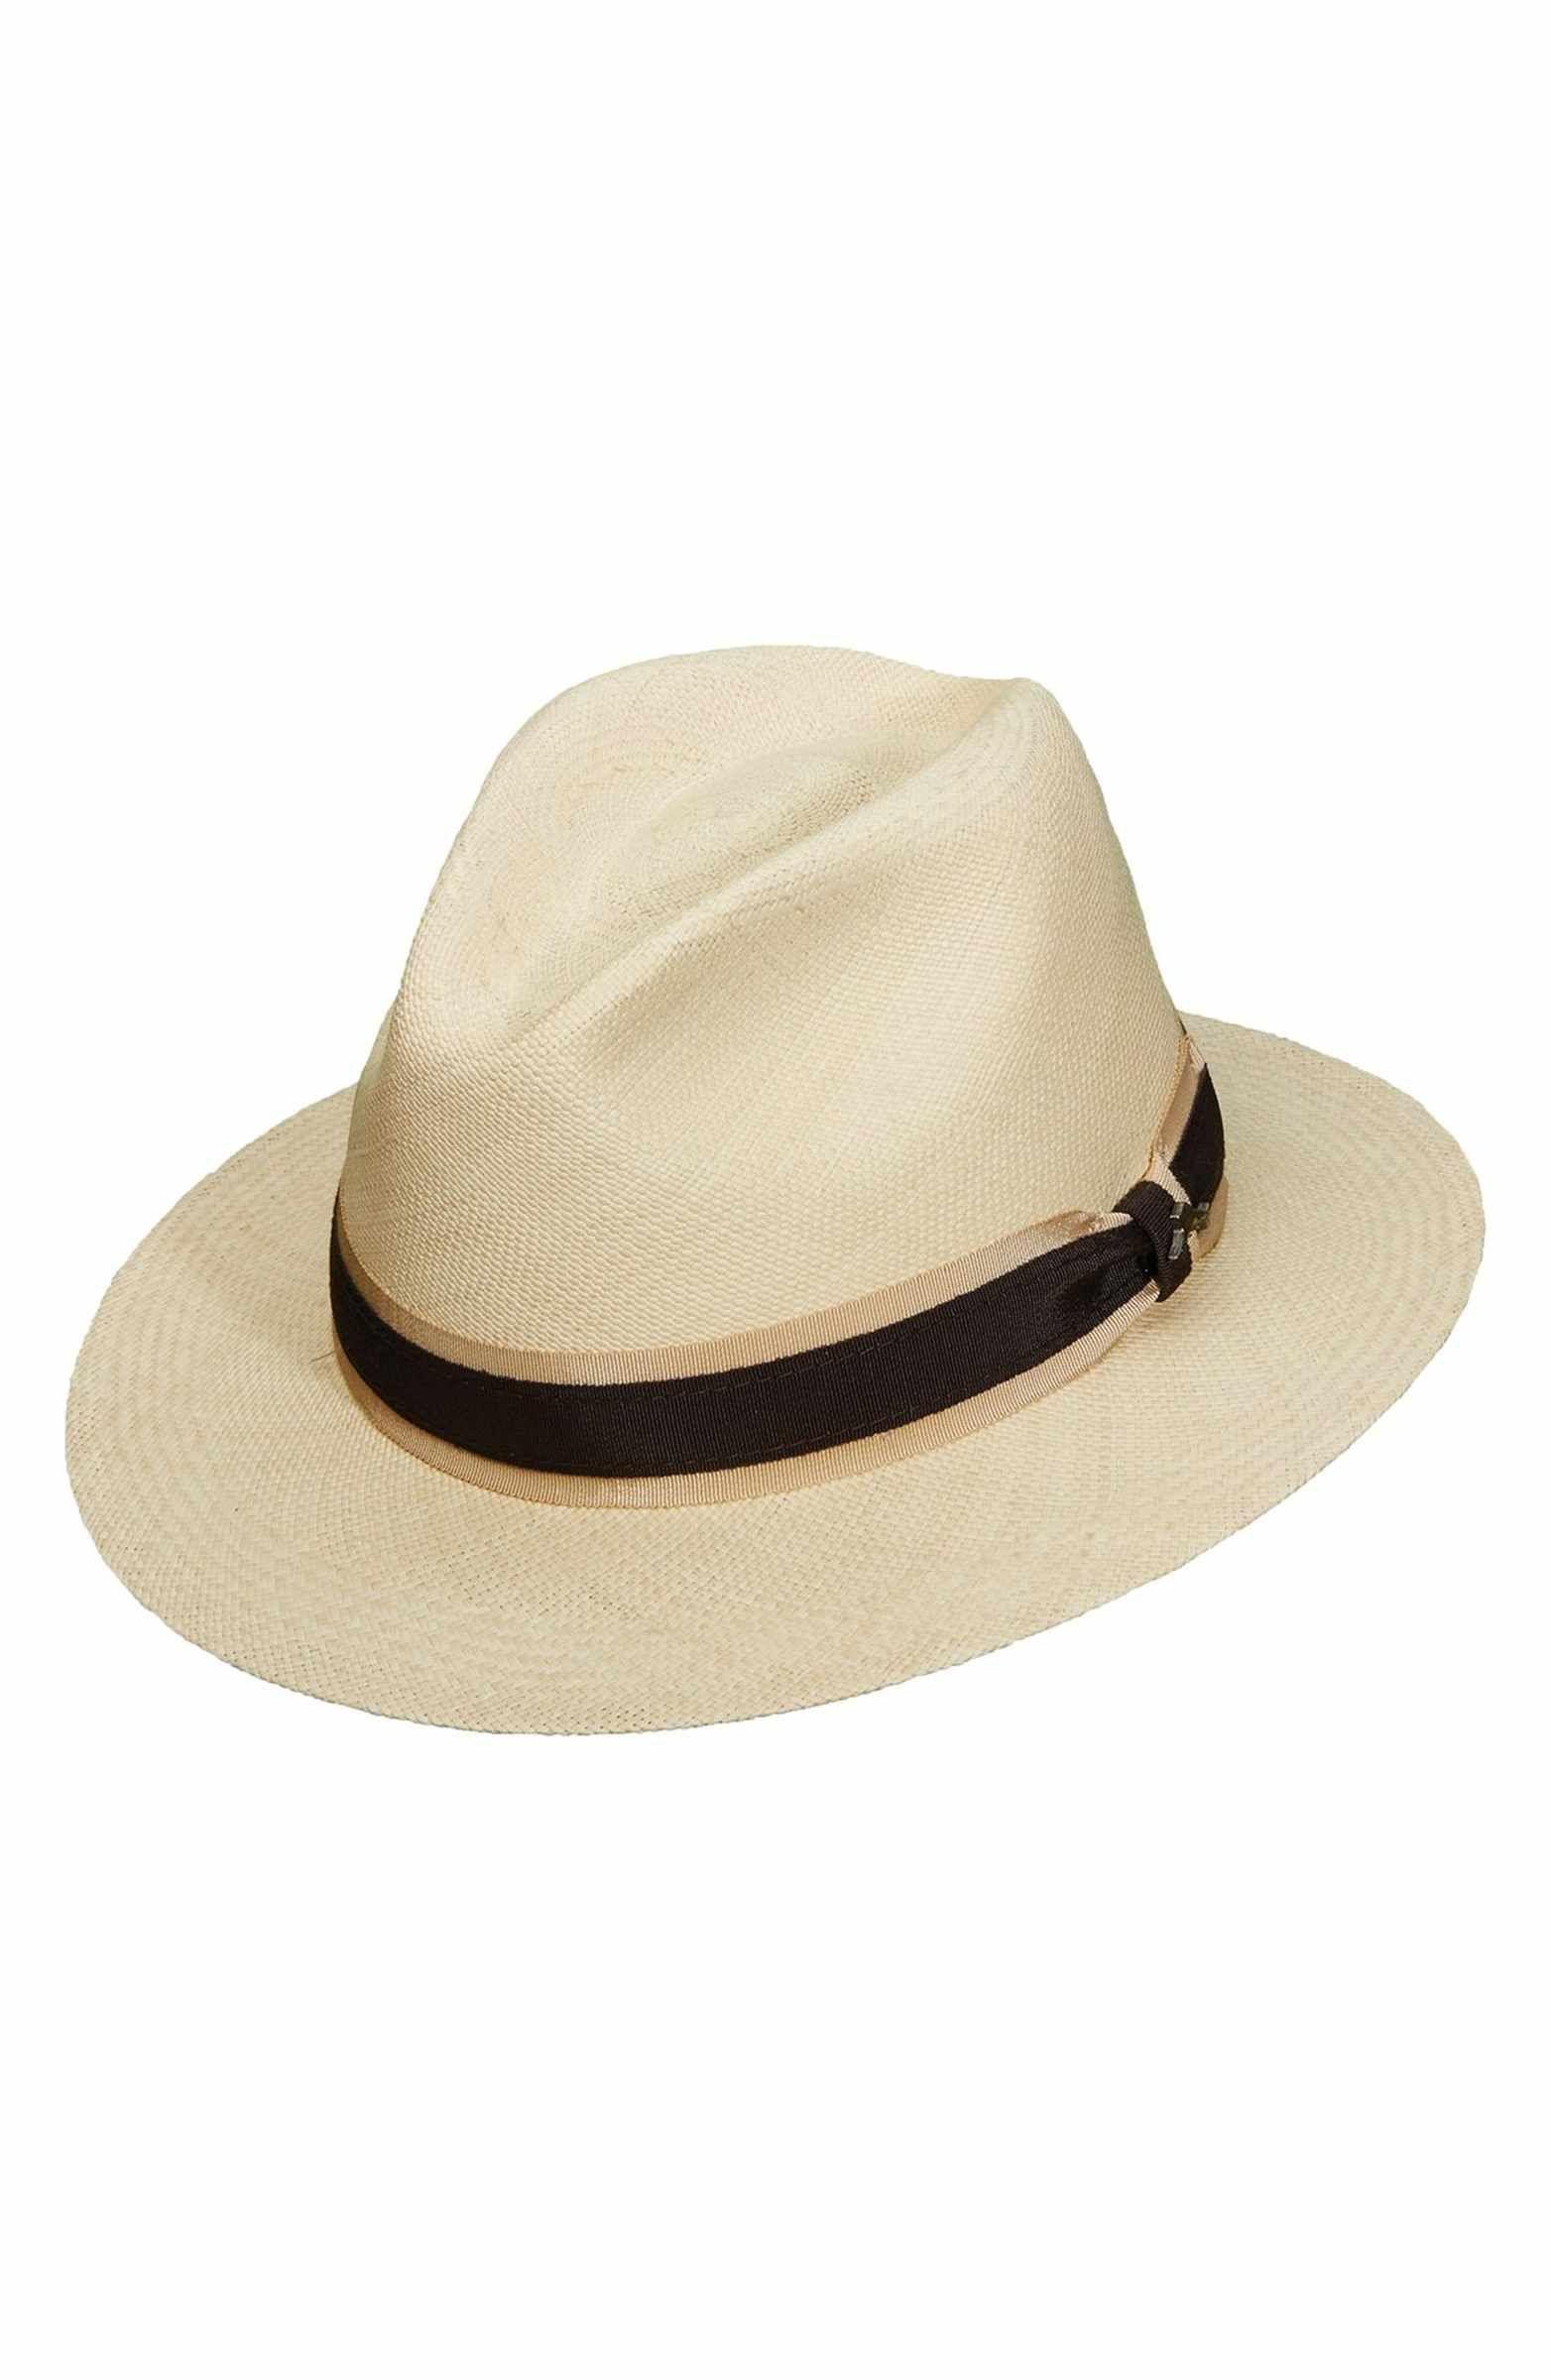 d59c4cac Main Image - Tommy Bahama Panama Straw Safari Hat | Men Dress Shoes ...